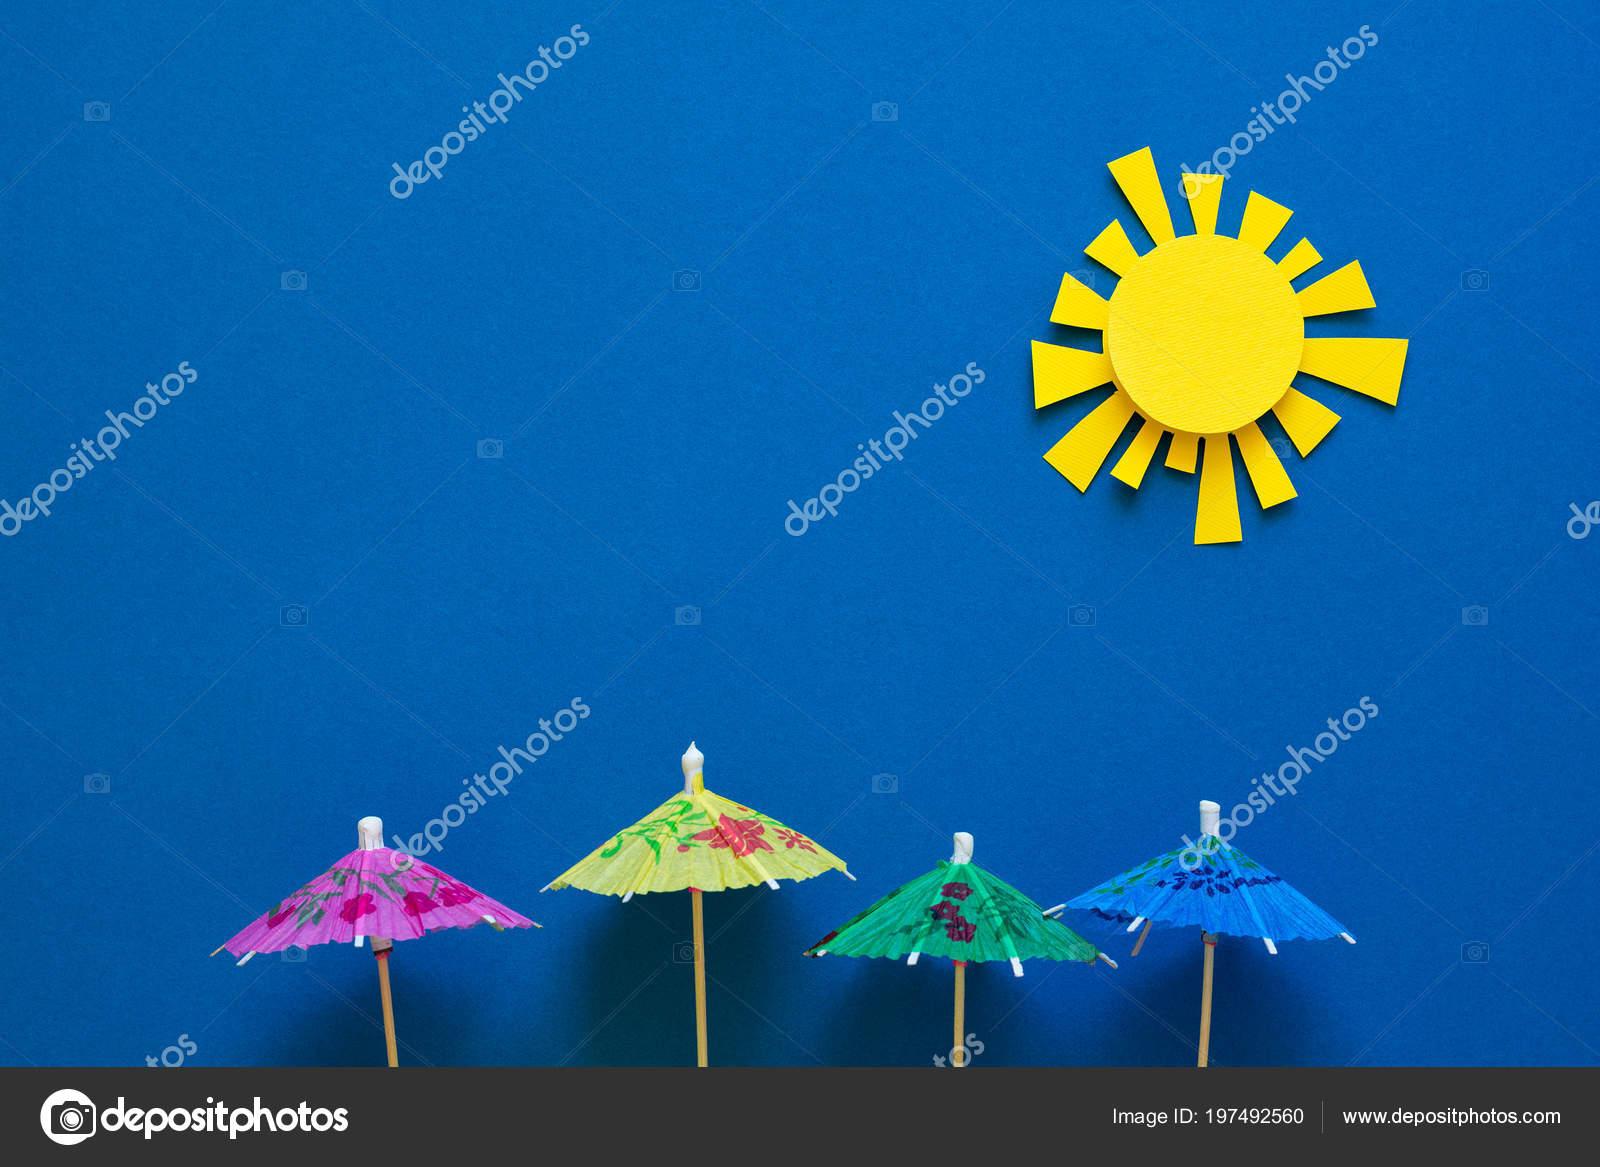 Paper Umbrellas Sun Origami Sun Protection Summer Vacation Concept